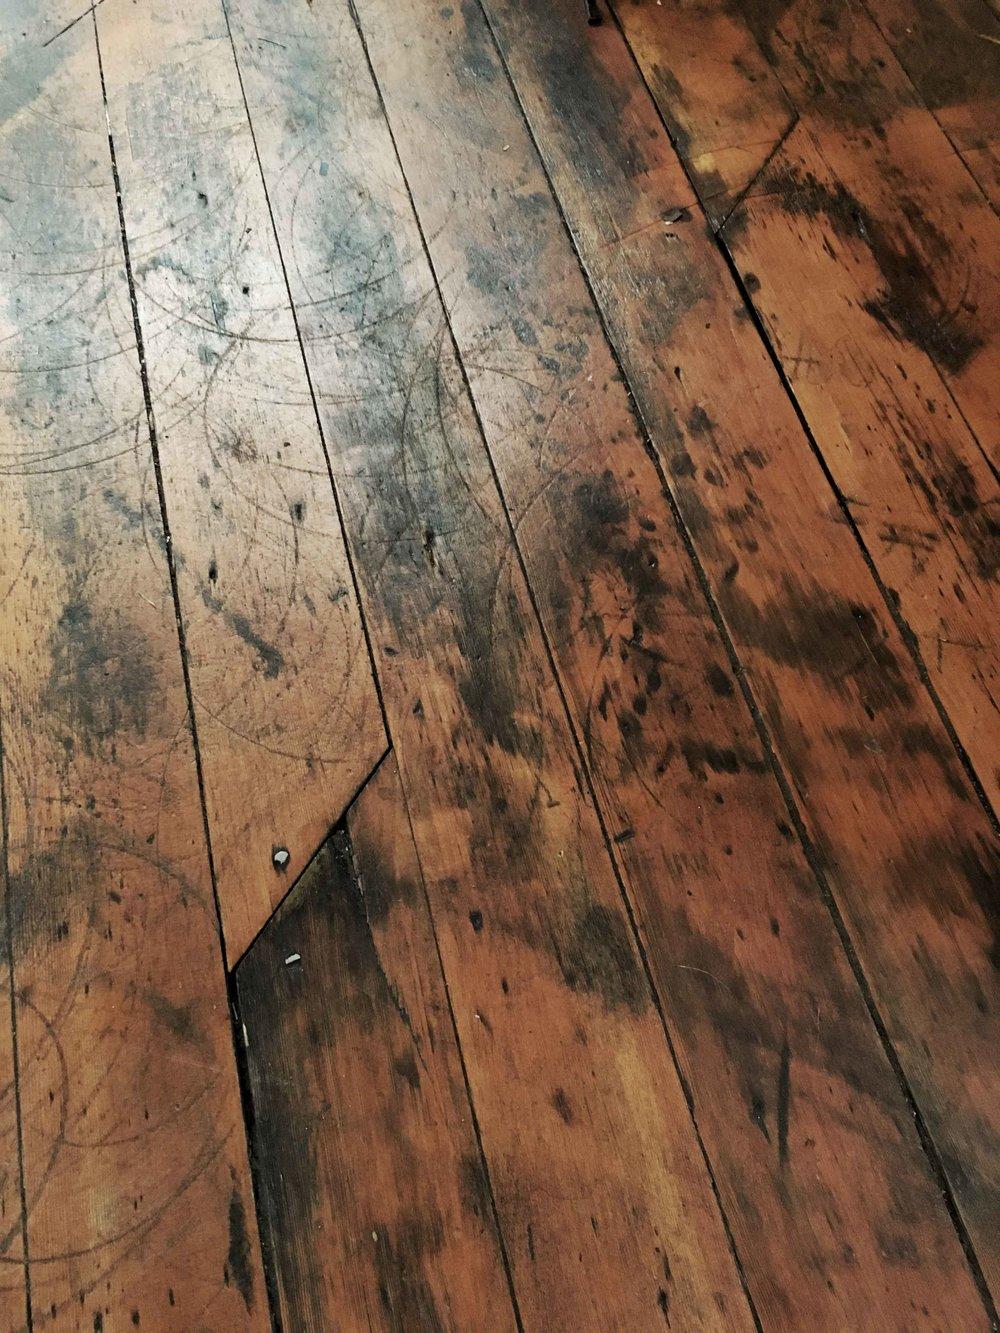 Scratched up hardwood floors